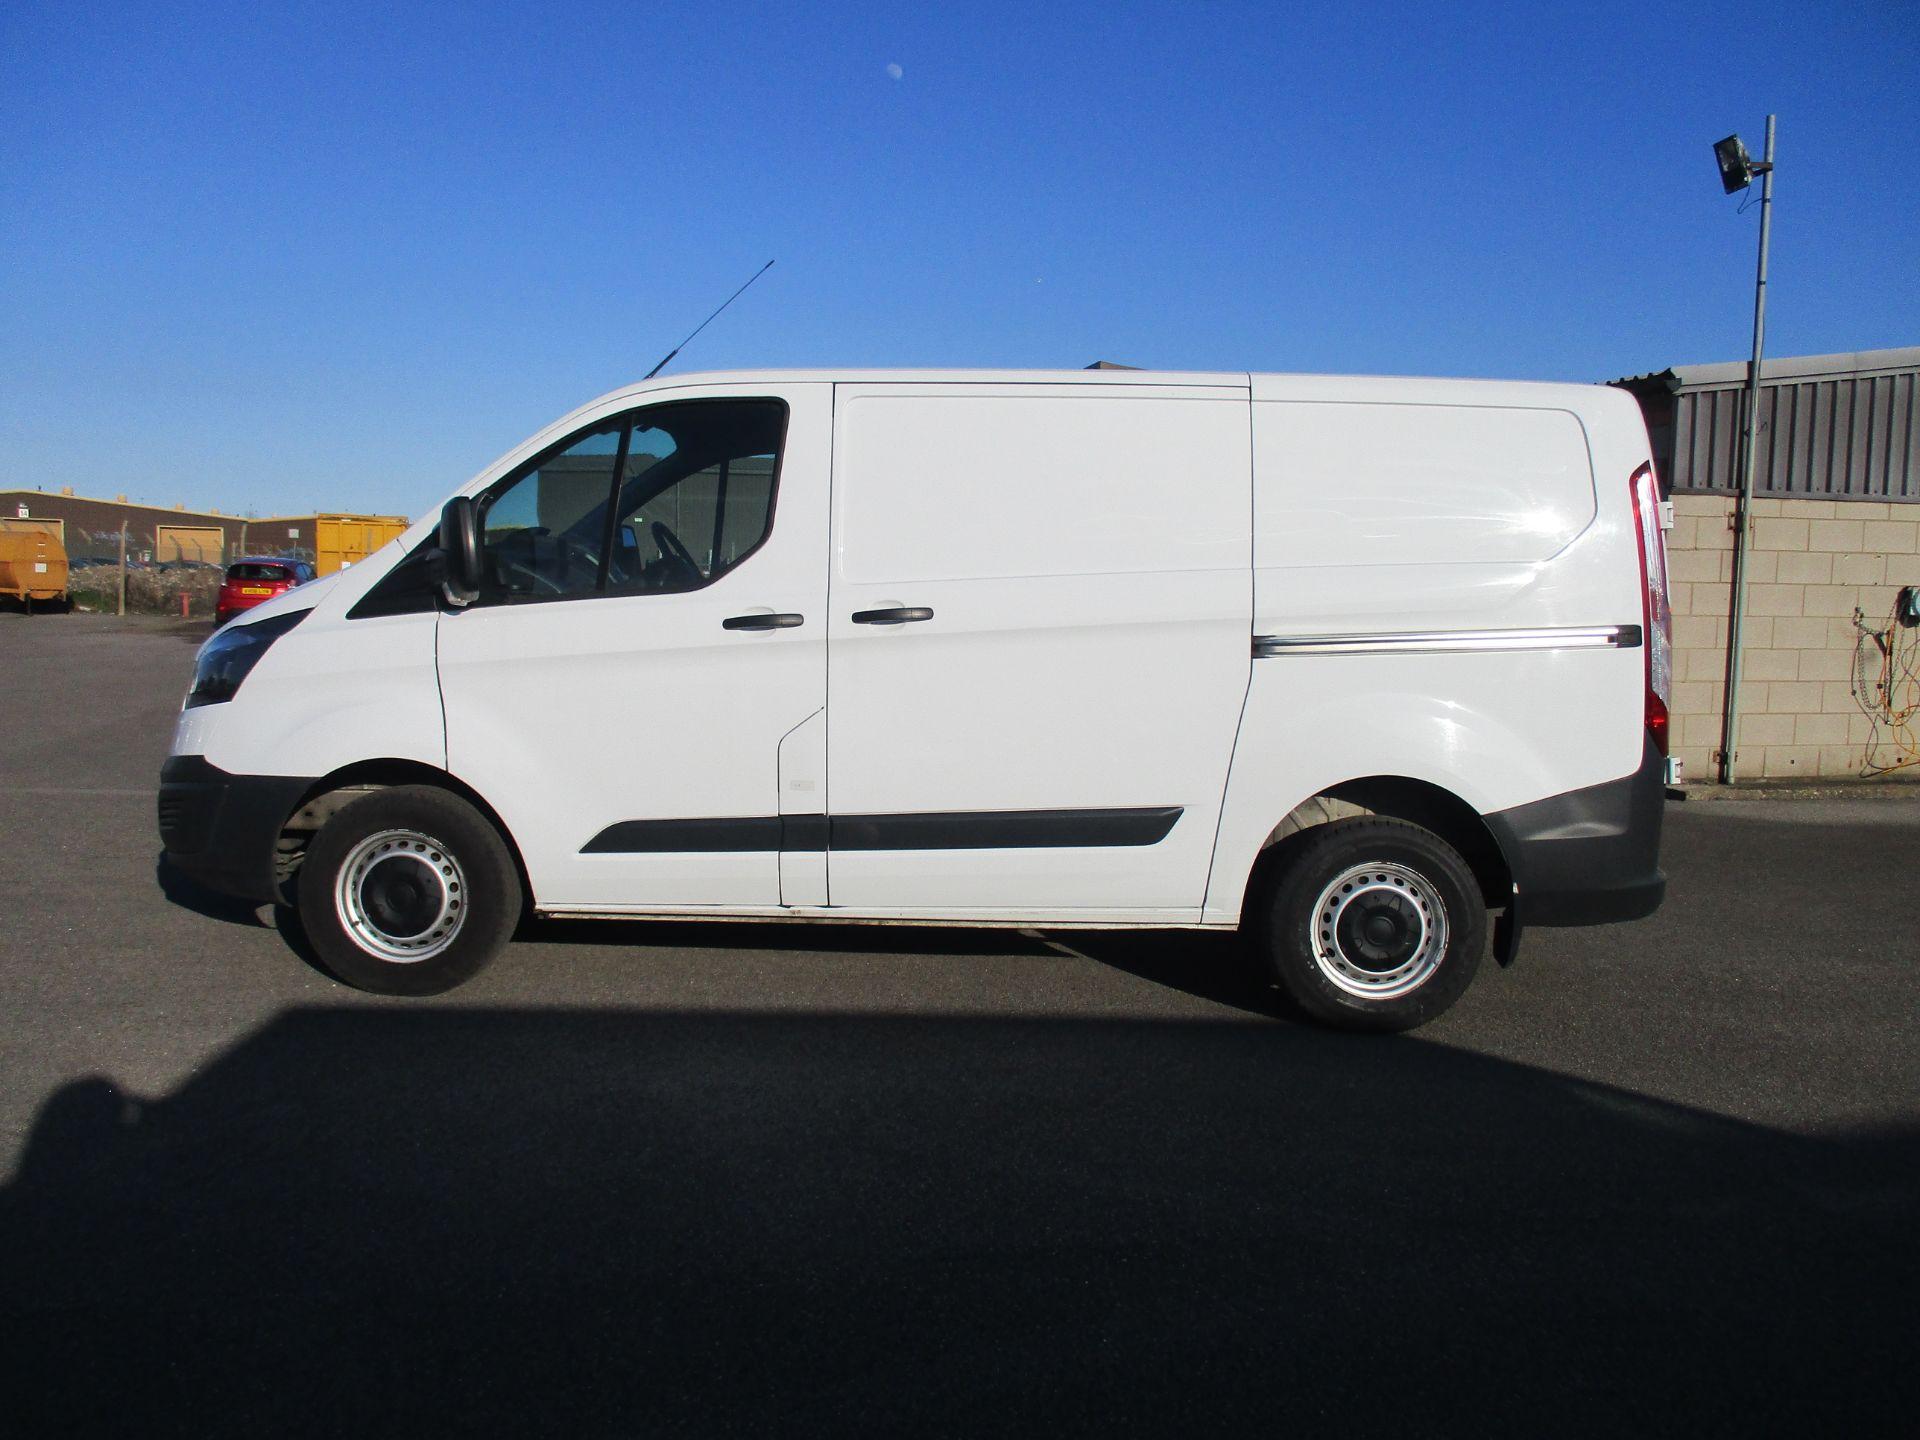 2017 Ford Transit Custom 290 L1 DIESEL FWD 2.0 TDCI 105PS LOW ROOF VAN EURO 6 (BN17PNJ) Image 8